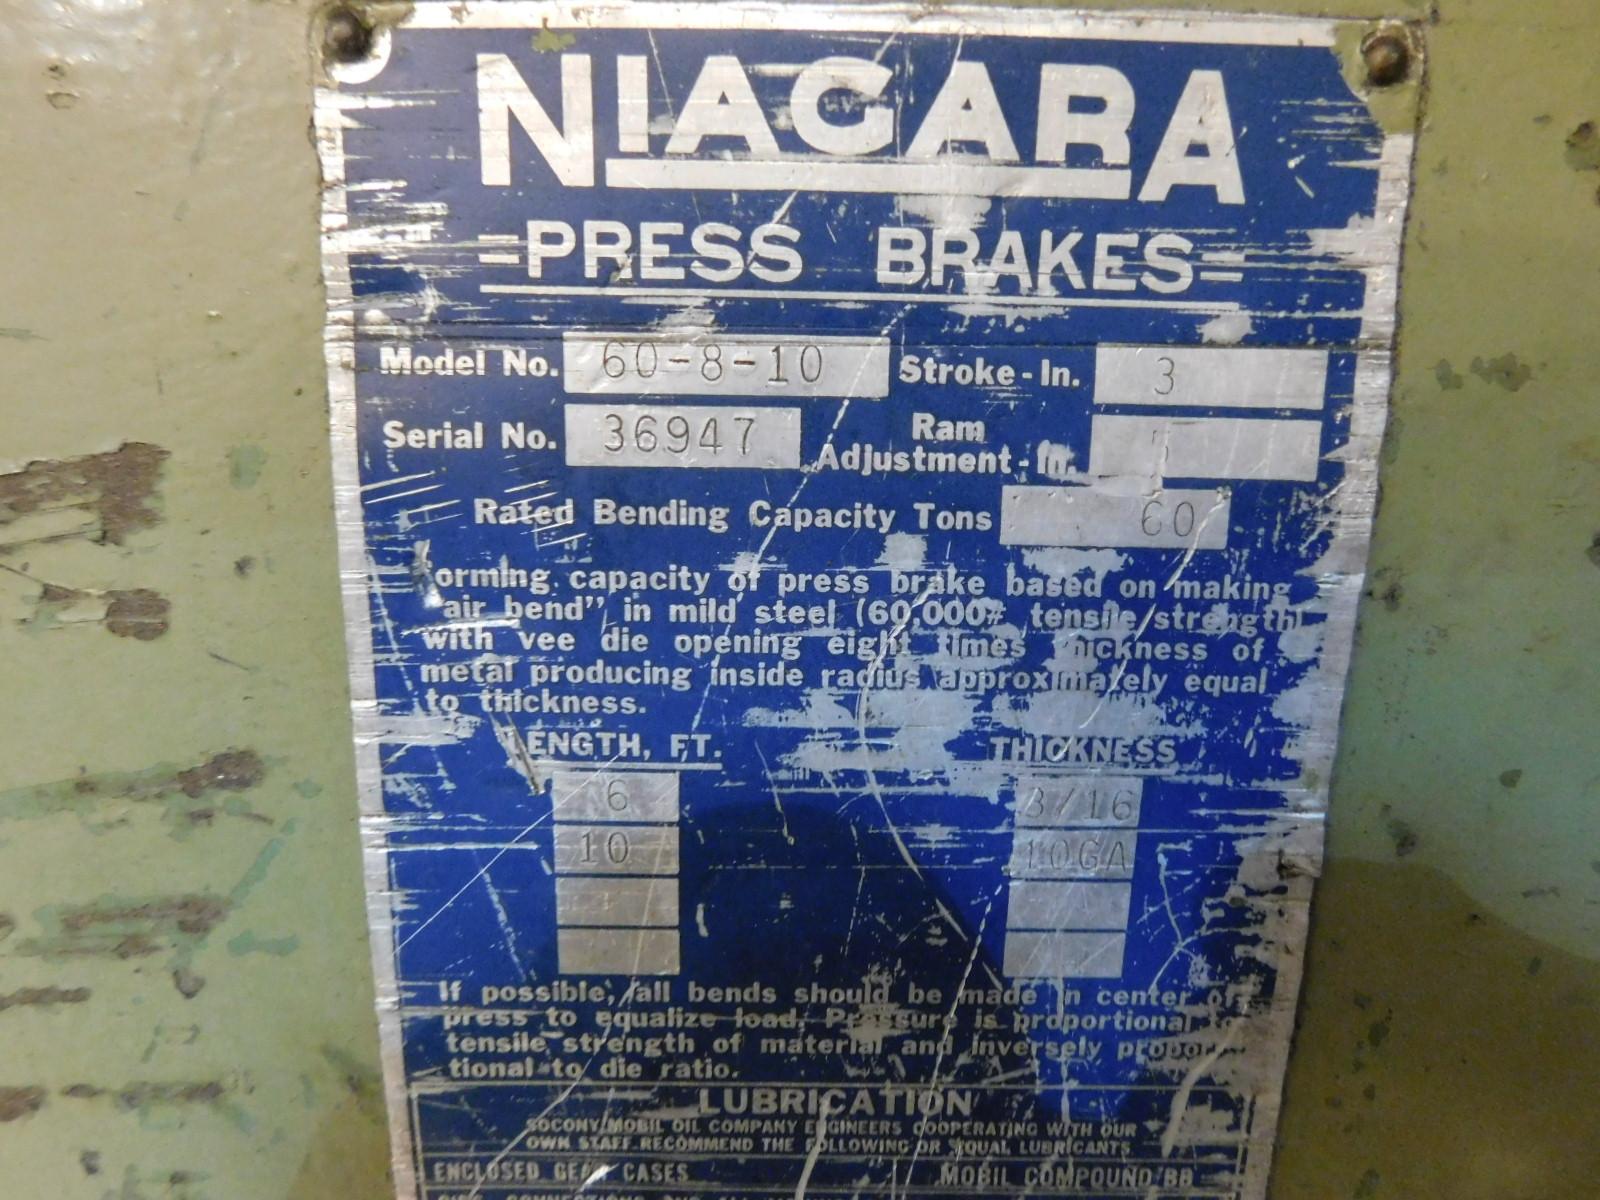 Lot 8 - NIAGARA 60-8-10 PRESS BRAKE, 60-TON X 10' CAPACITY, S/N 36947